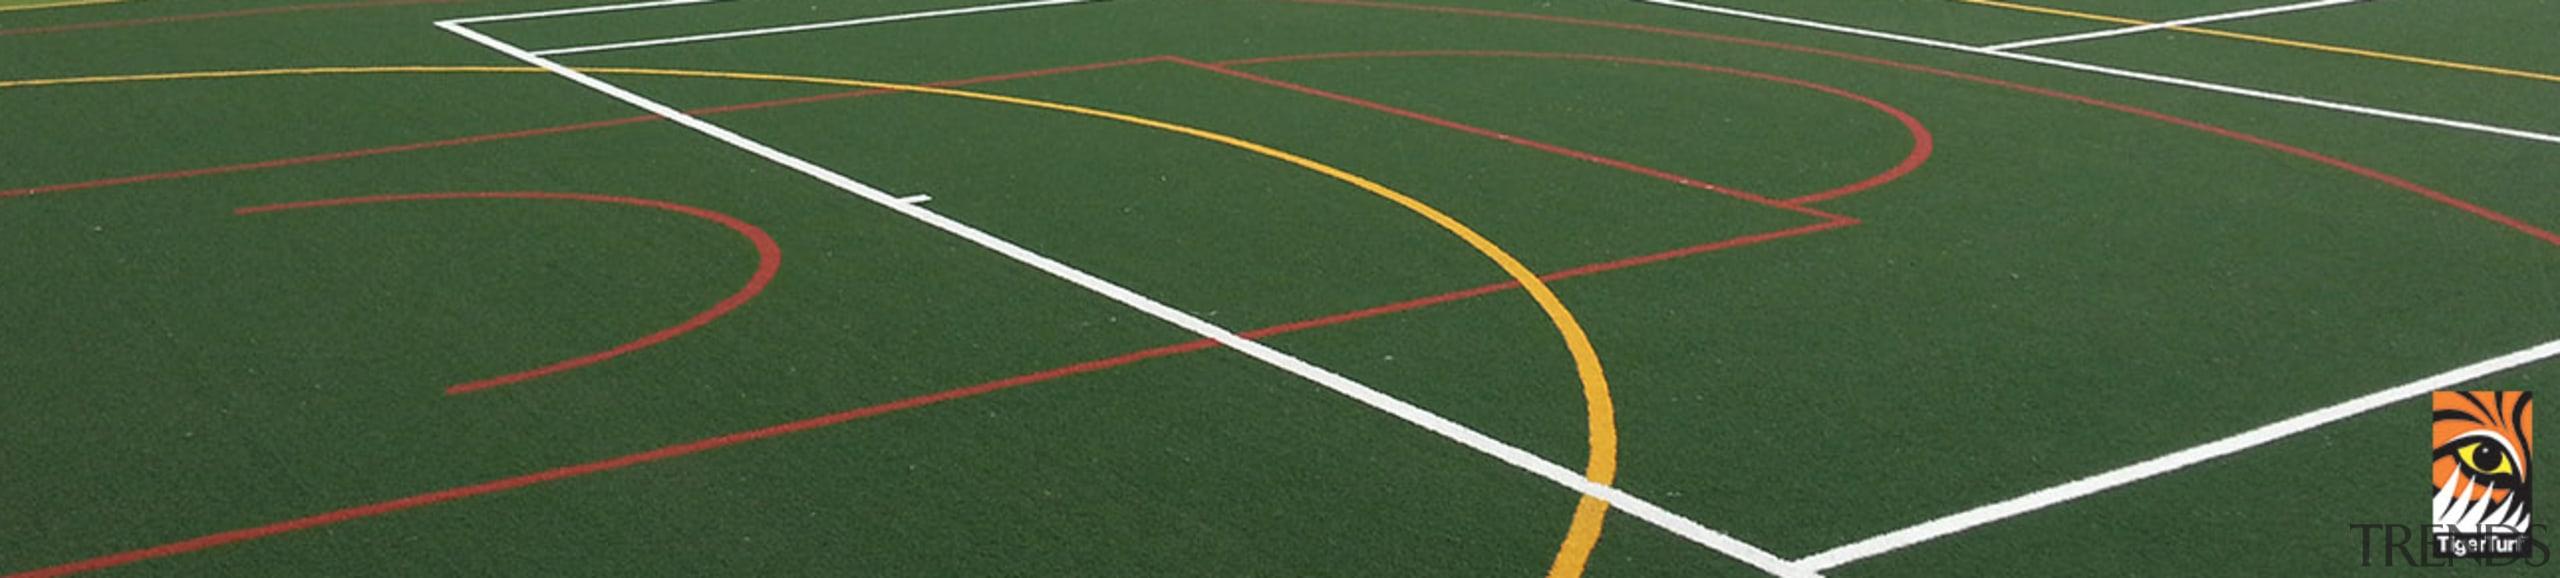 Screen Shot 2019 06 14 at 12 31 artificial turf, field hockey, field lacrosse, flooring, grass, green, lacrosse, line, parallel, plant, race track, sport venue, sports, stadium, team sport, green